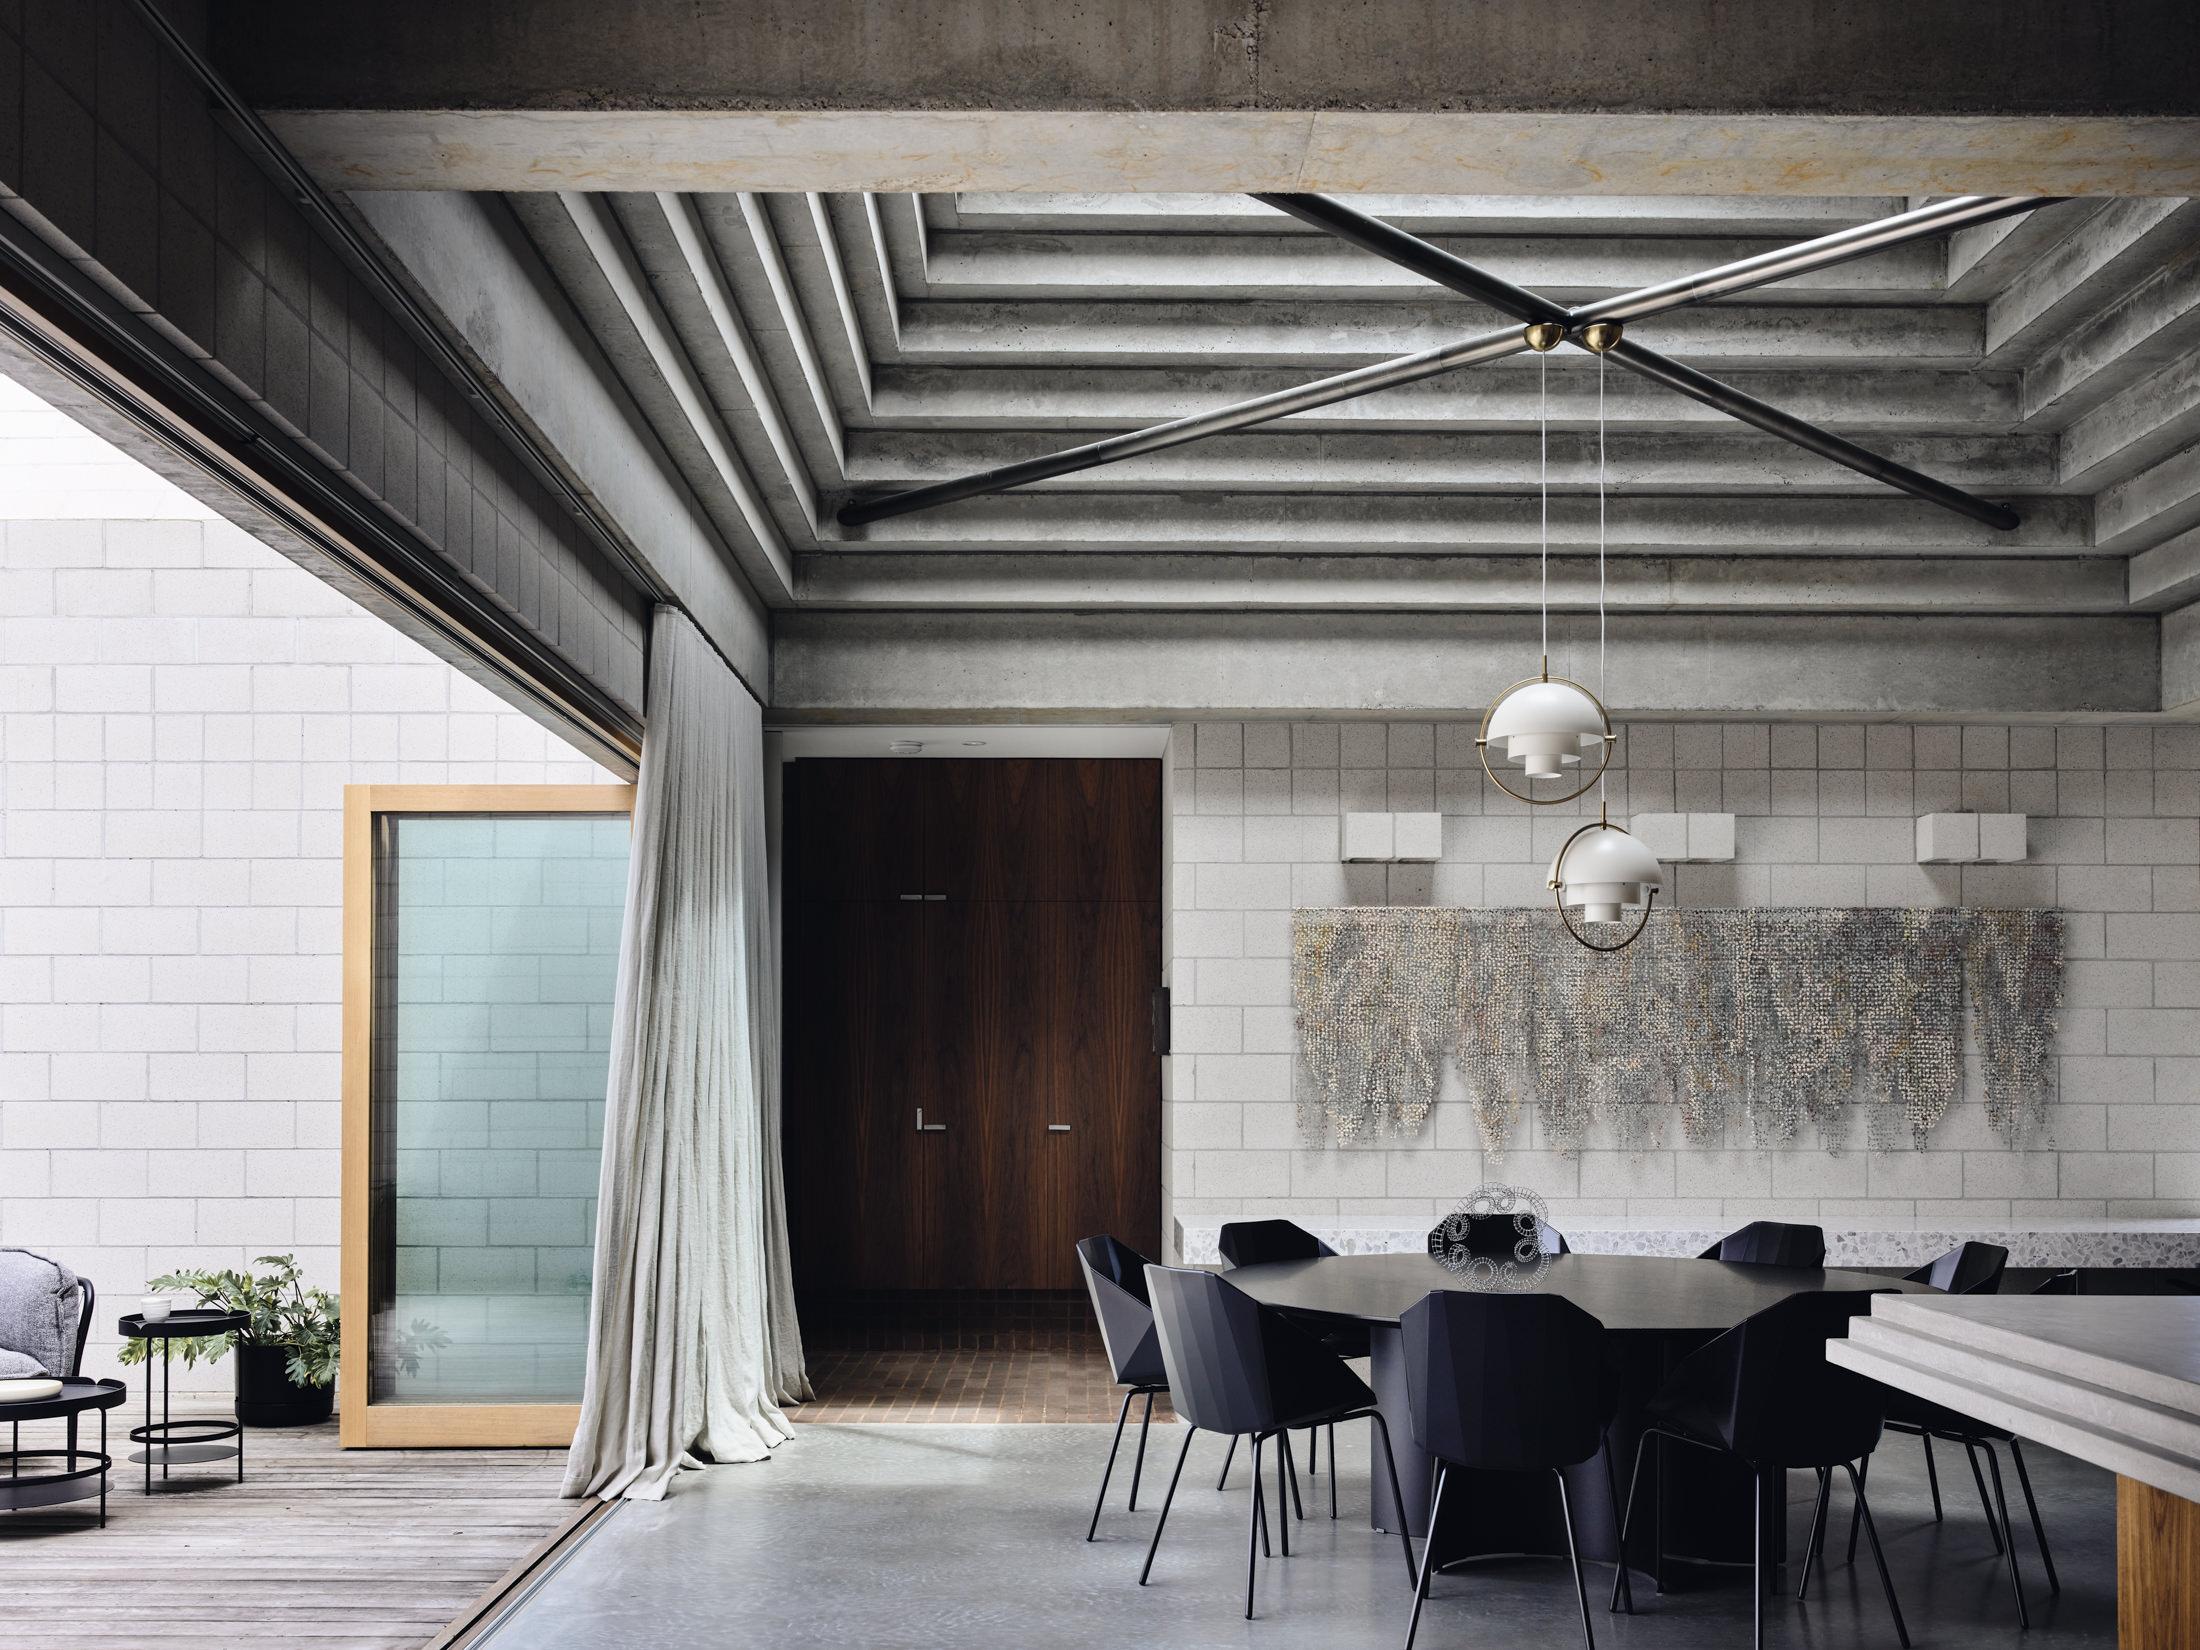 Architects Eat Bellows Beach House Flinders Masonry Architecture Photo Derek Swalwell Yellowtrace 23